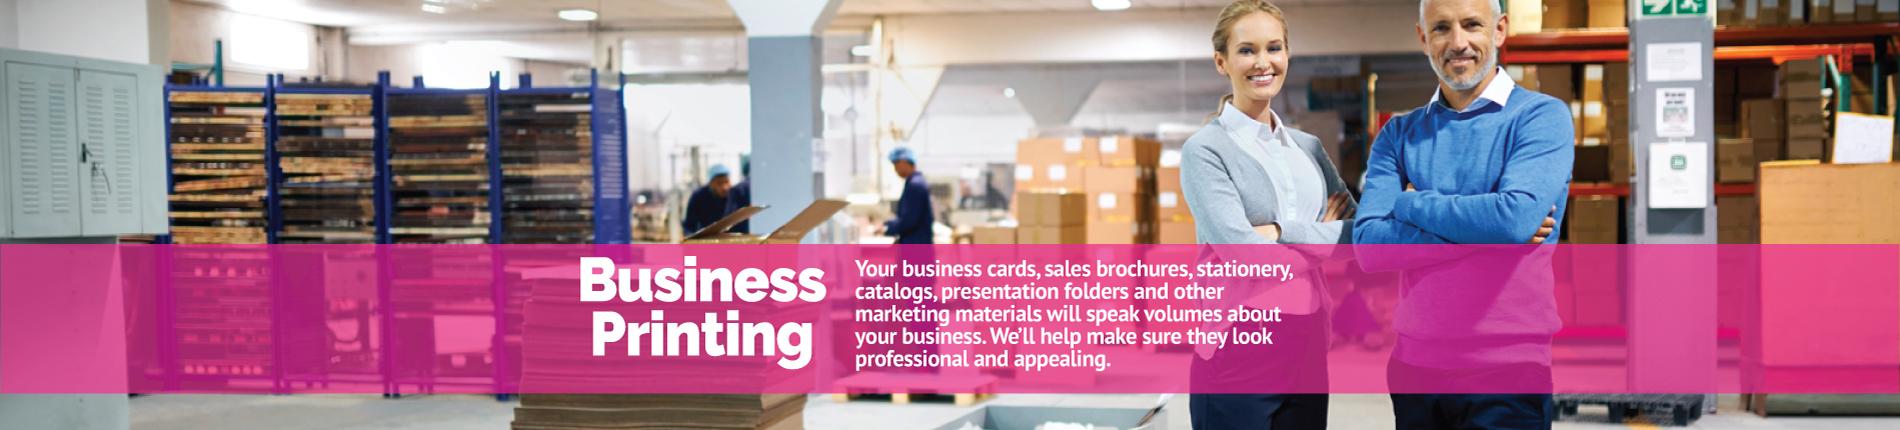 ElectroImage_businessprinting_slider1